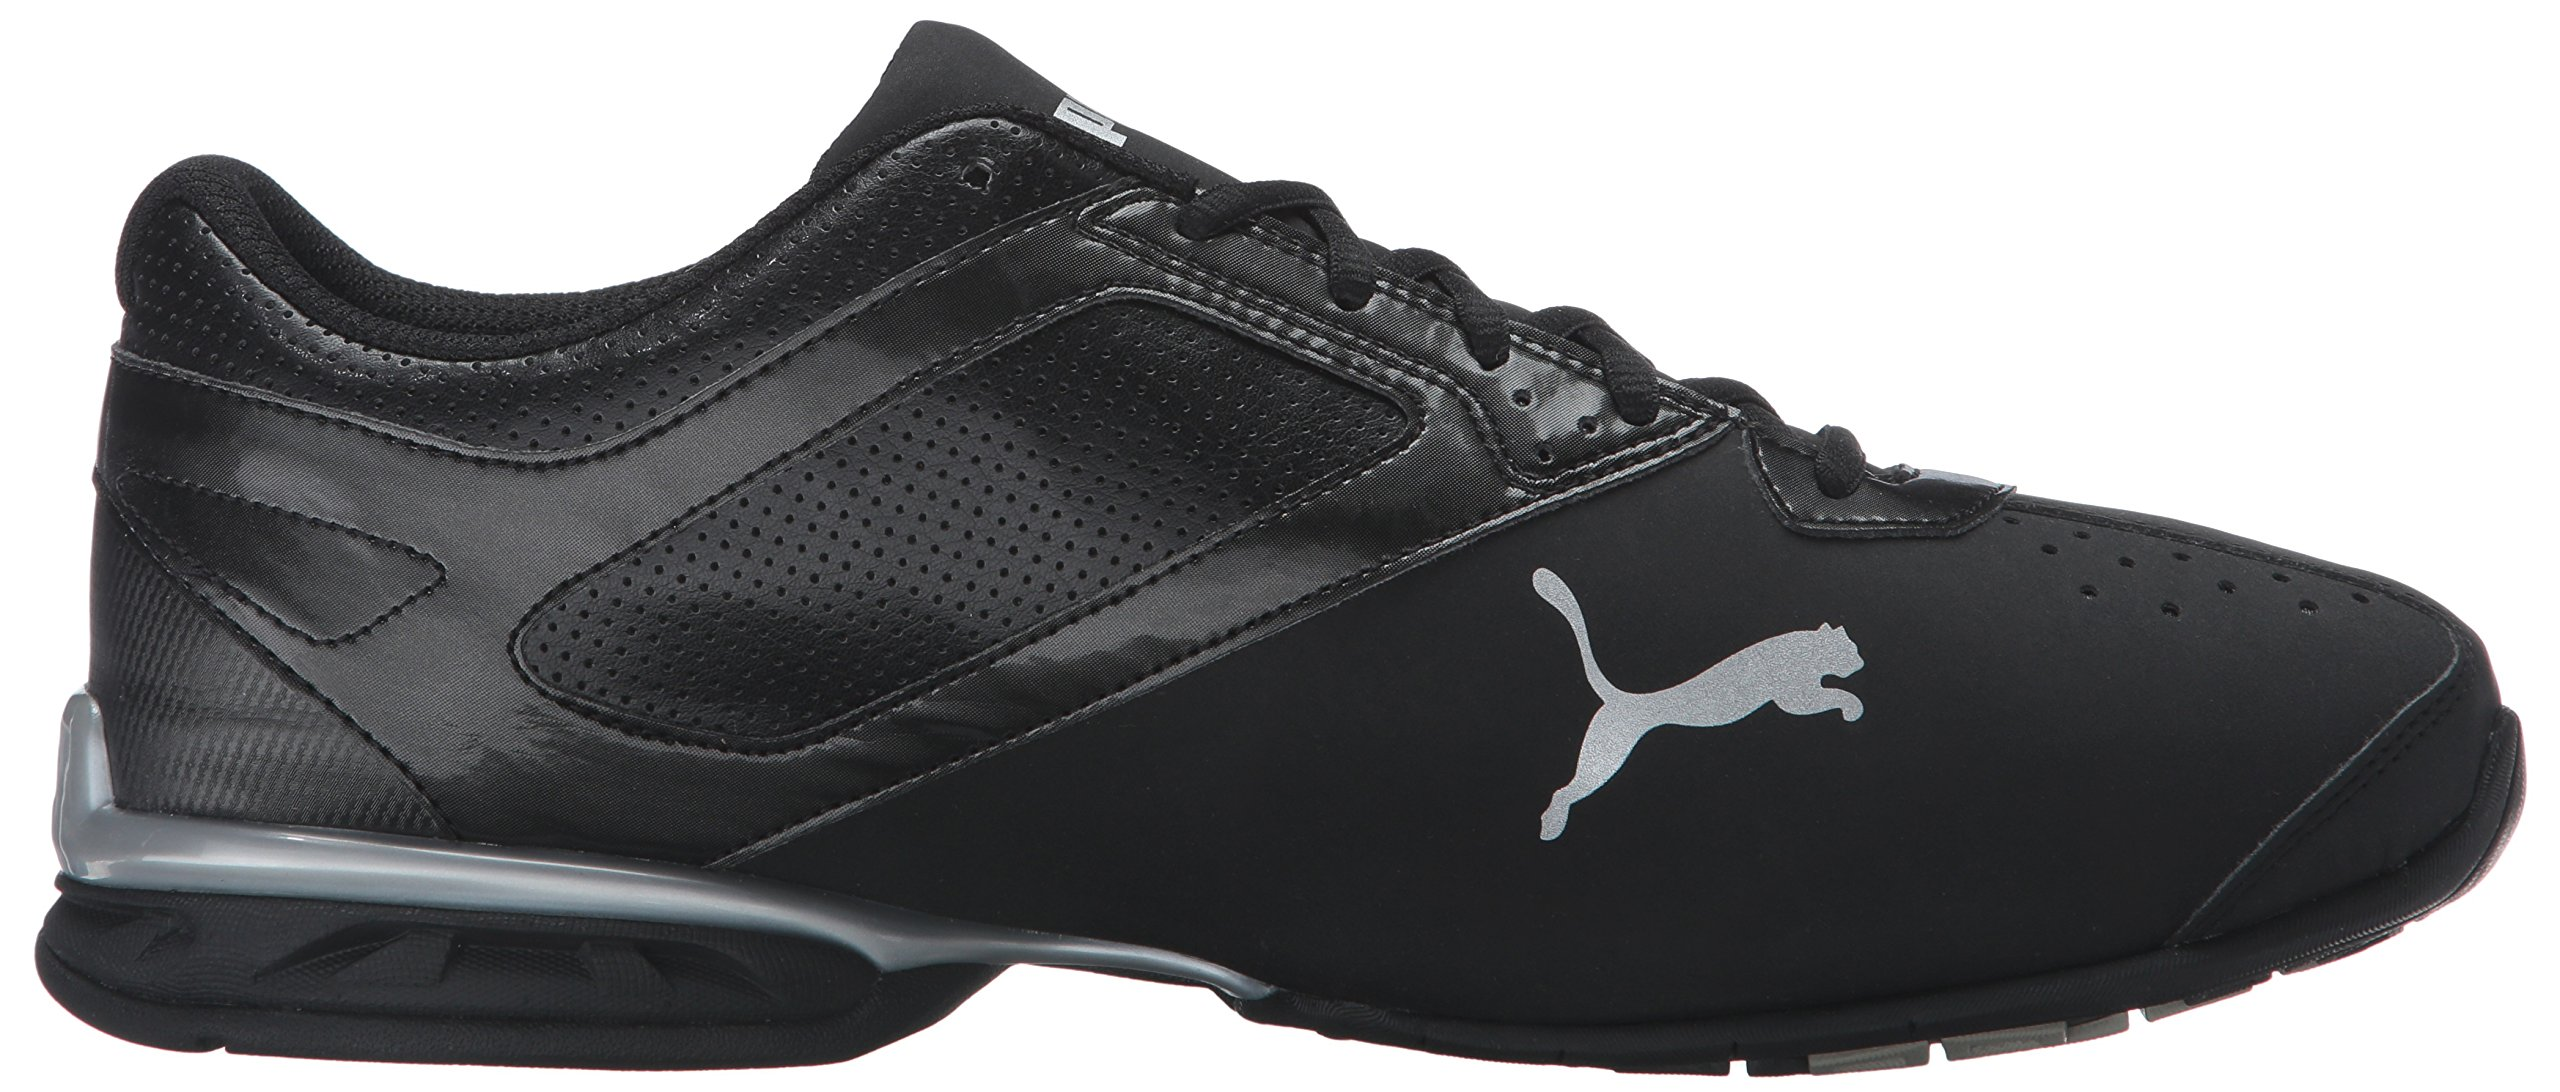 PUMA Men's Tazon 6 FM Puma Black/ Puma Silver Running Shoe - 8 D(M) US by PUMA (Image #7)